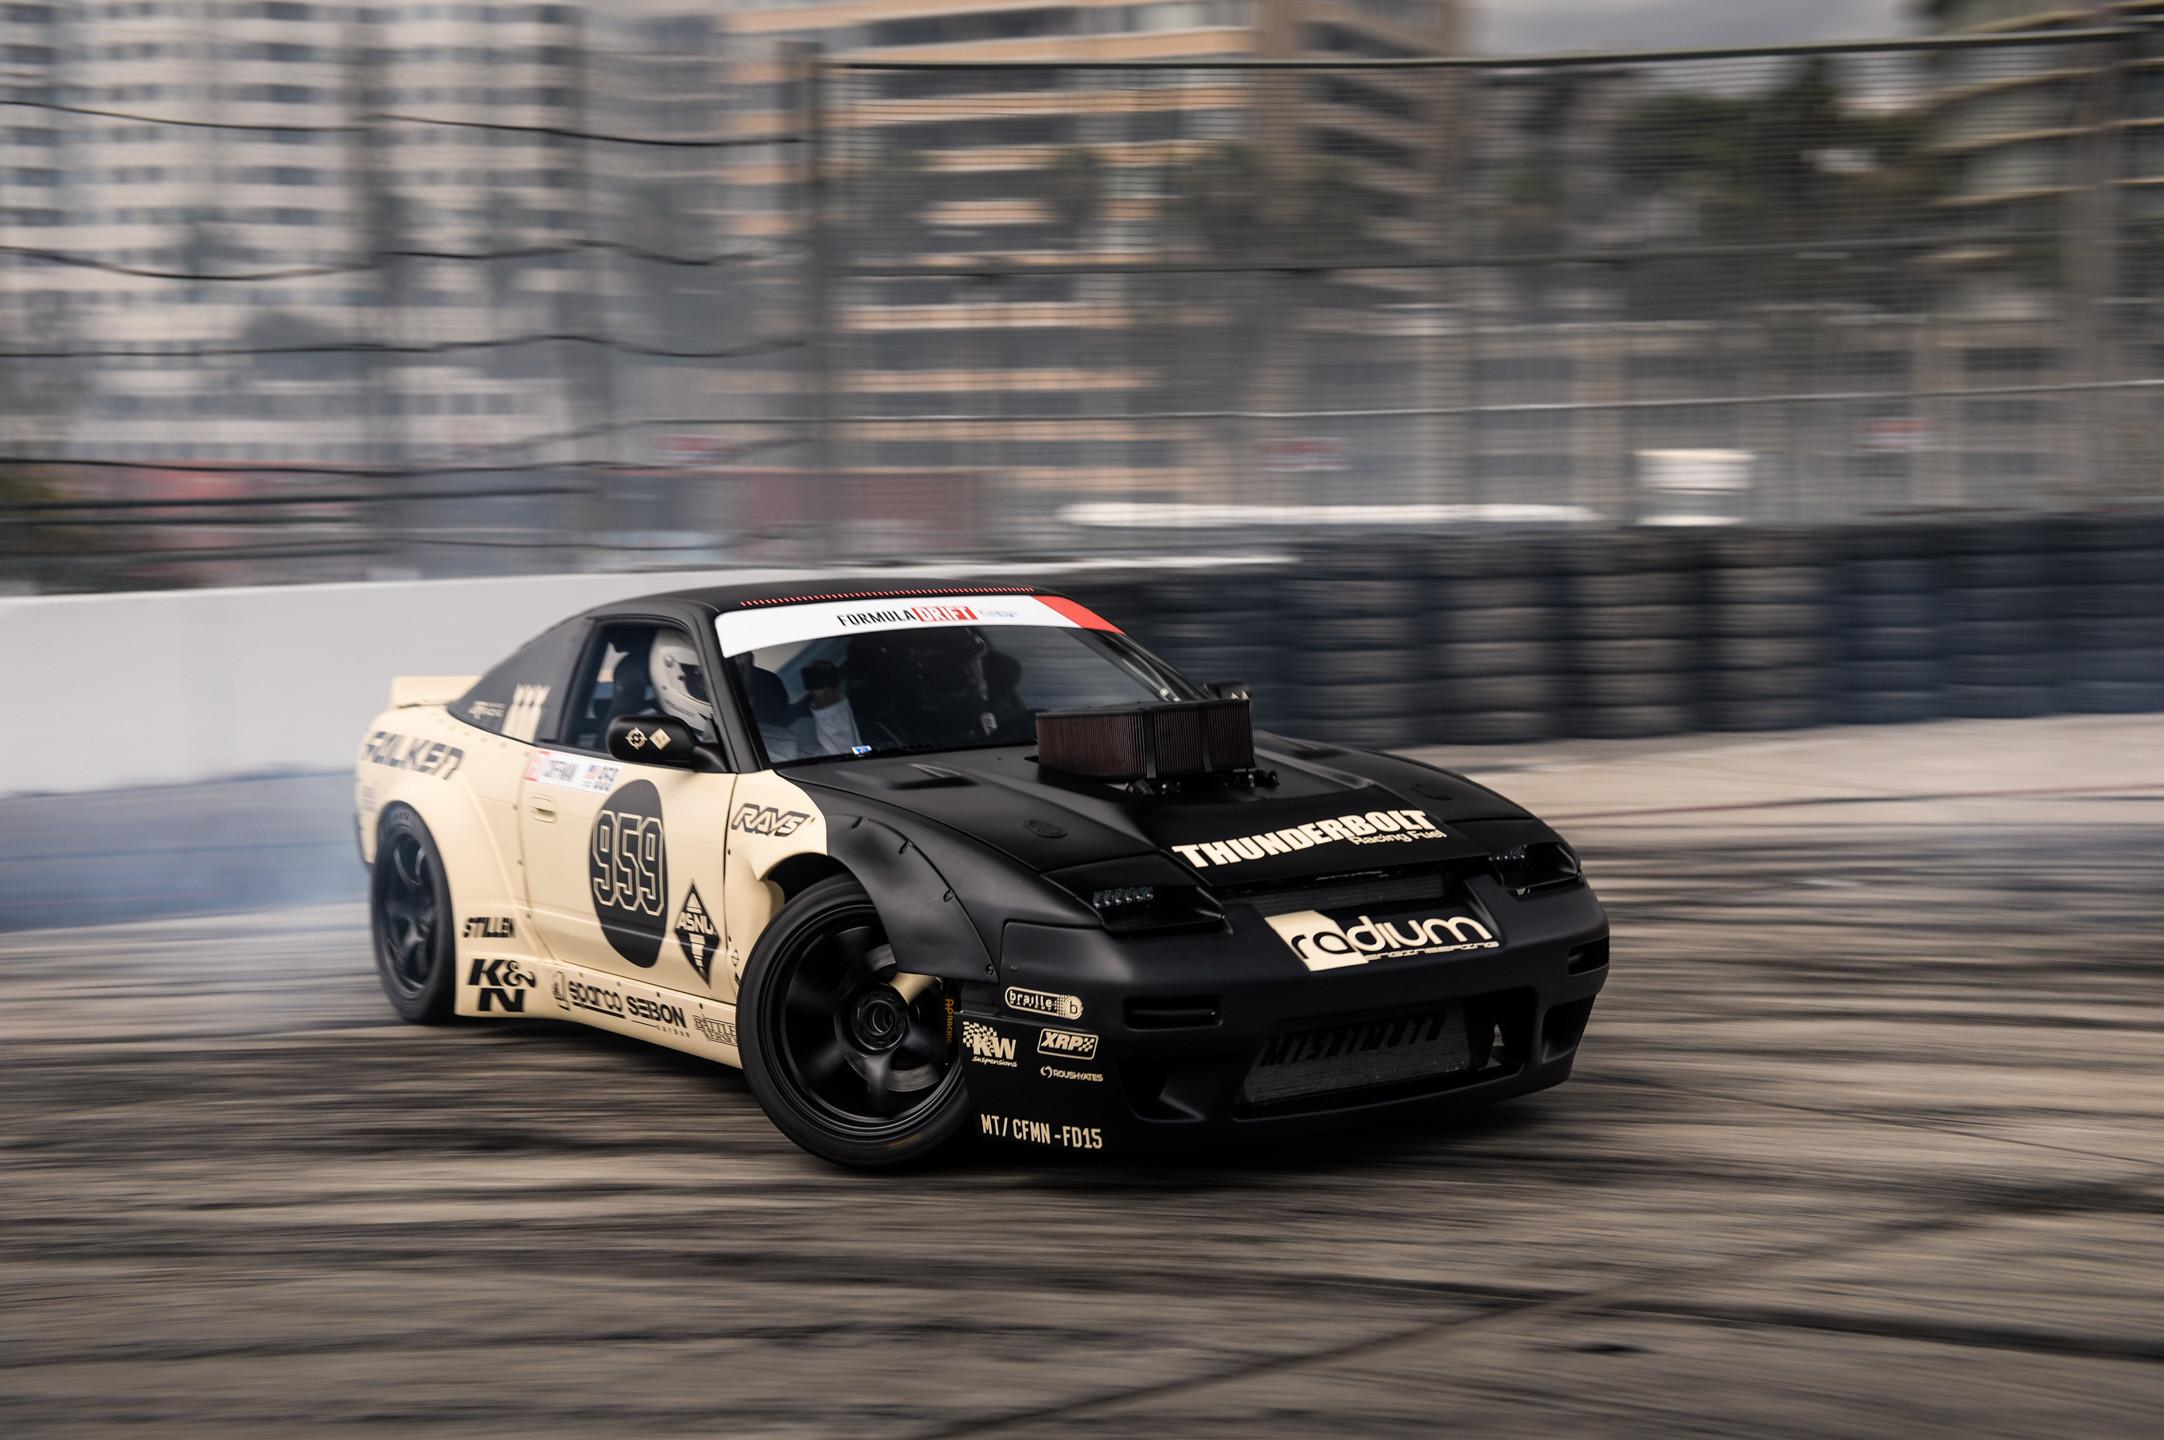 street racing cars wallpaper for desktop